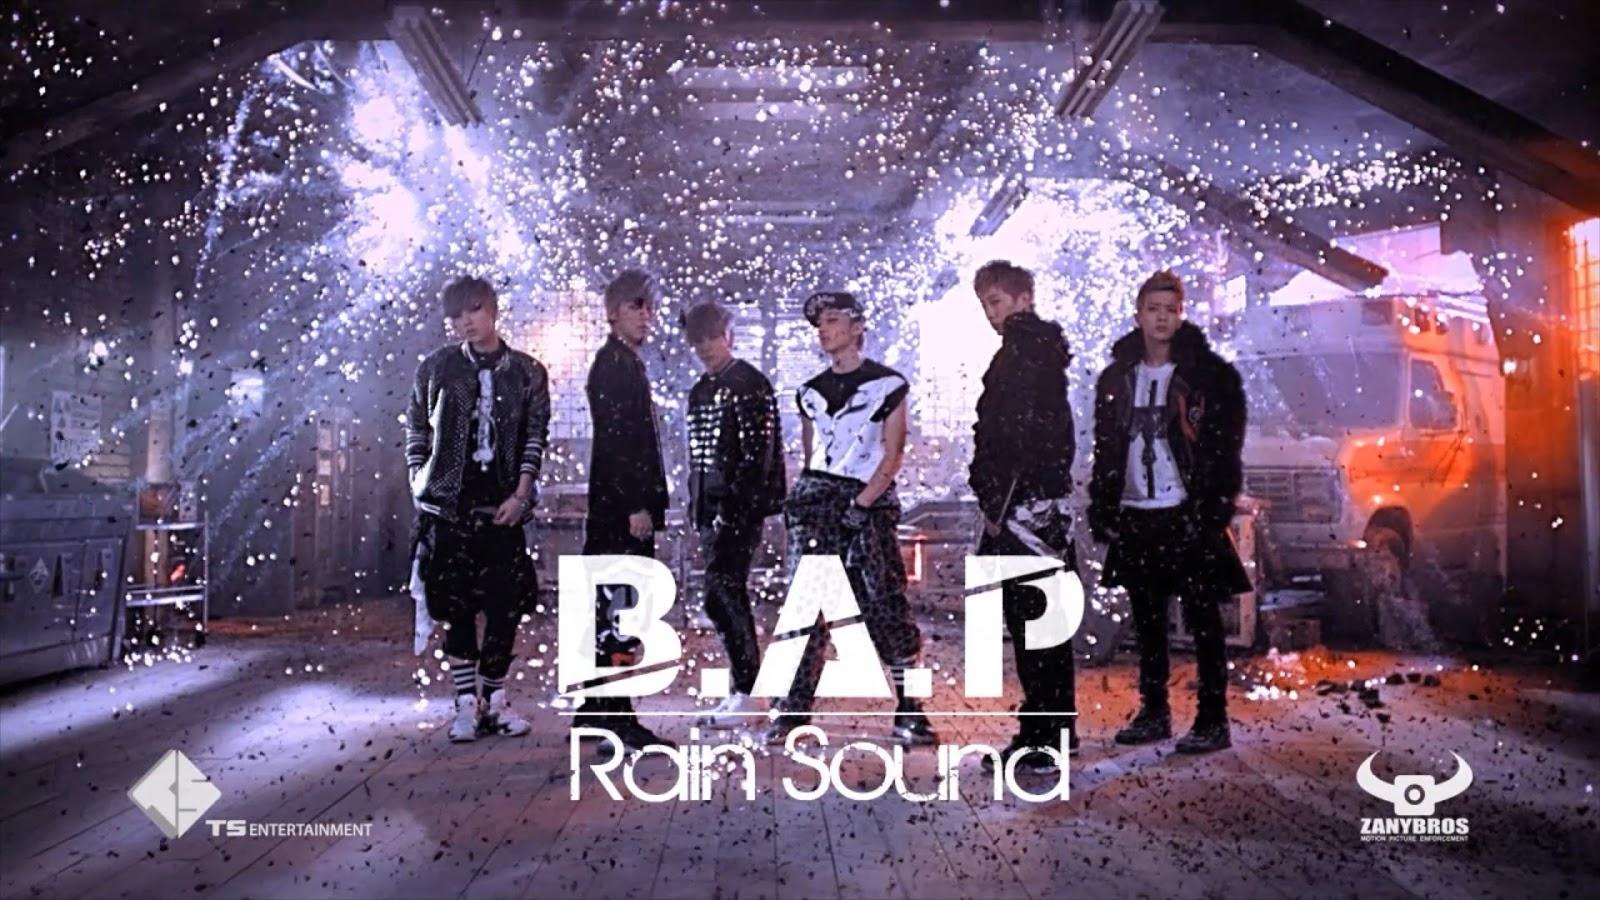 Kpop music videos: [download] [mv] b. A. P 빗소리 (rain sound.